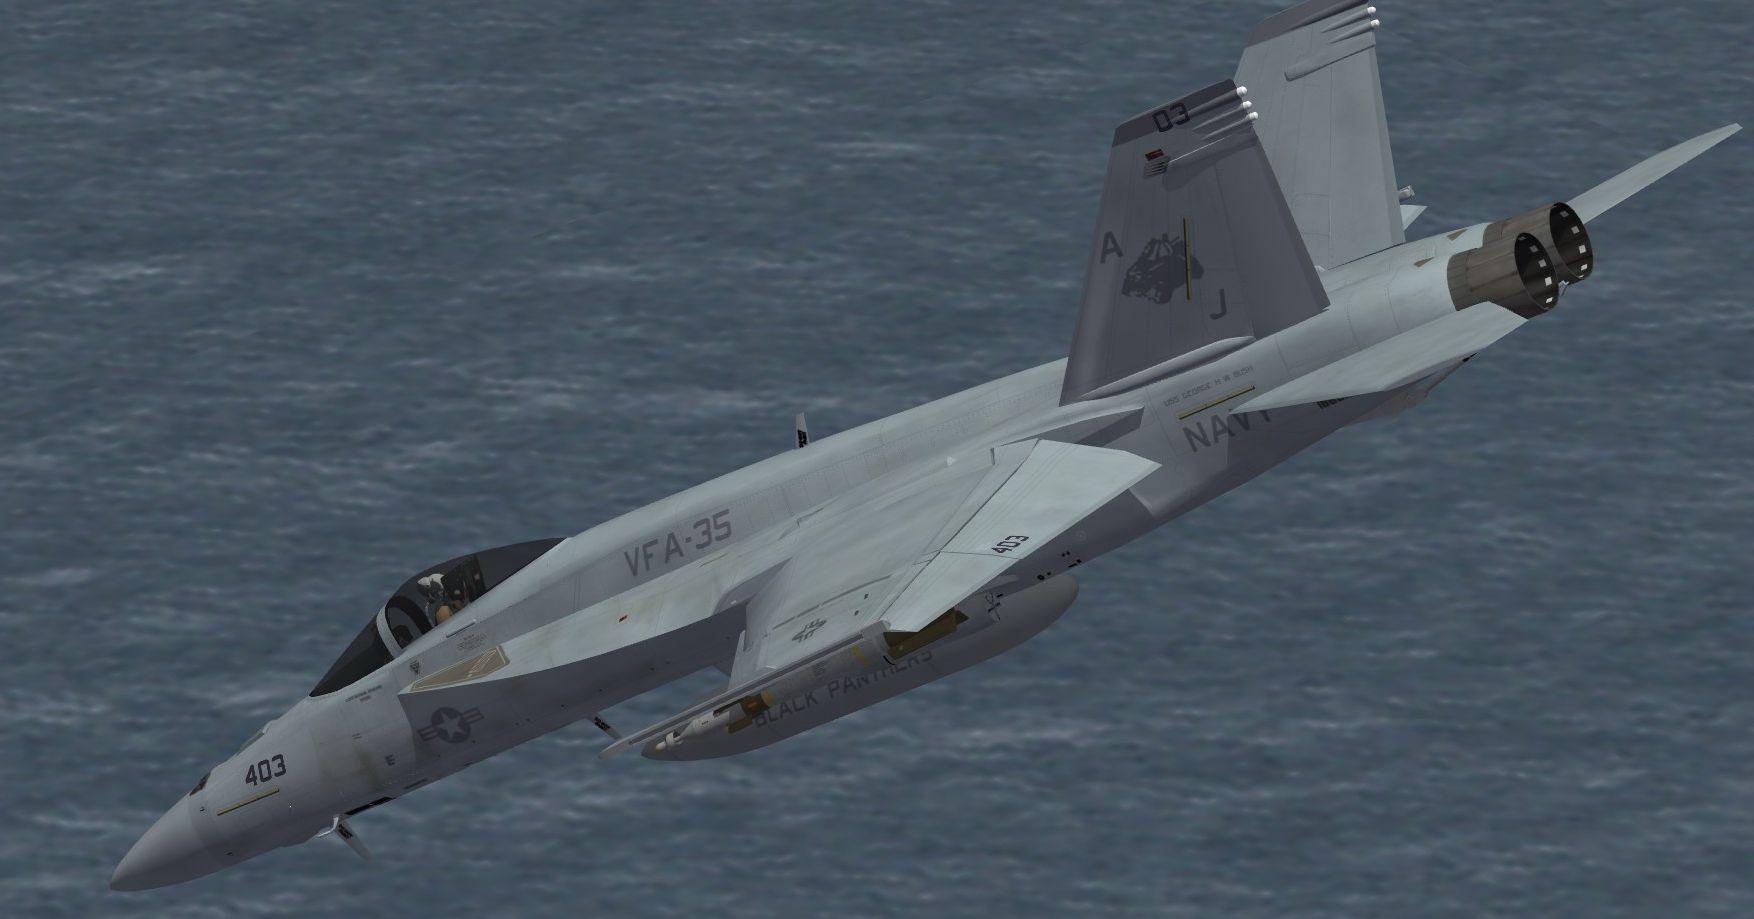 VFA-35 Line Blk II [Fictional]